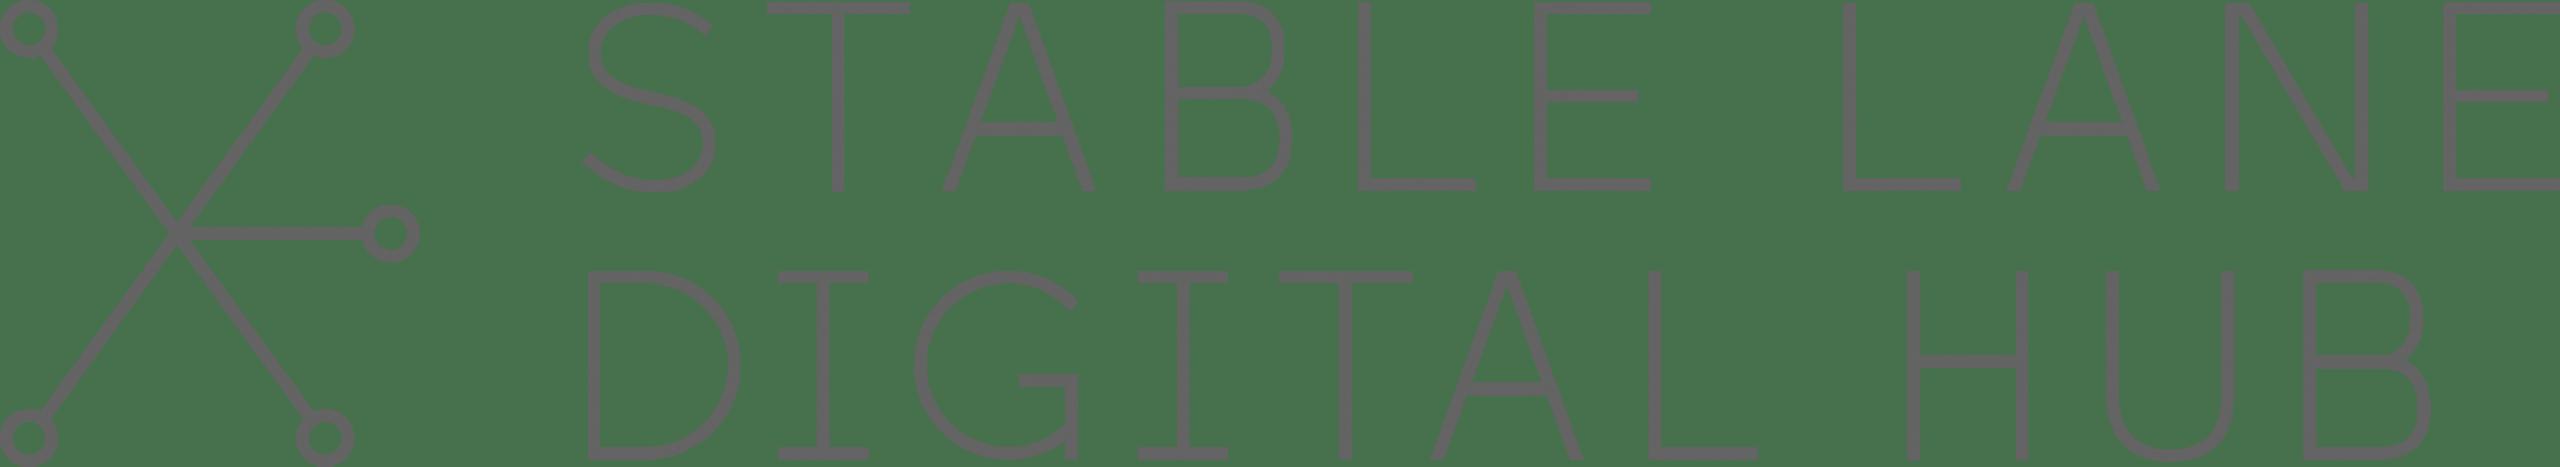 Stable Lane Digital Hub Logo